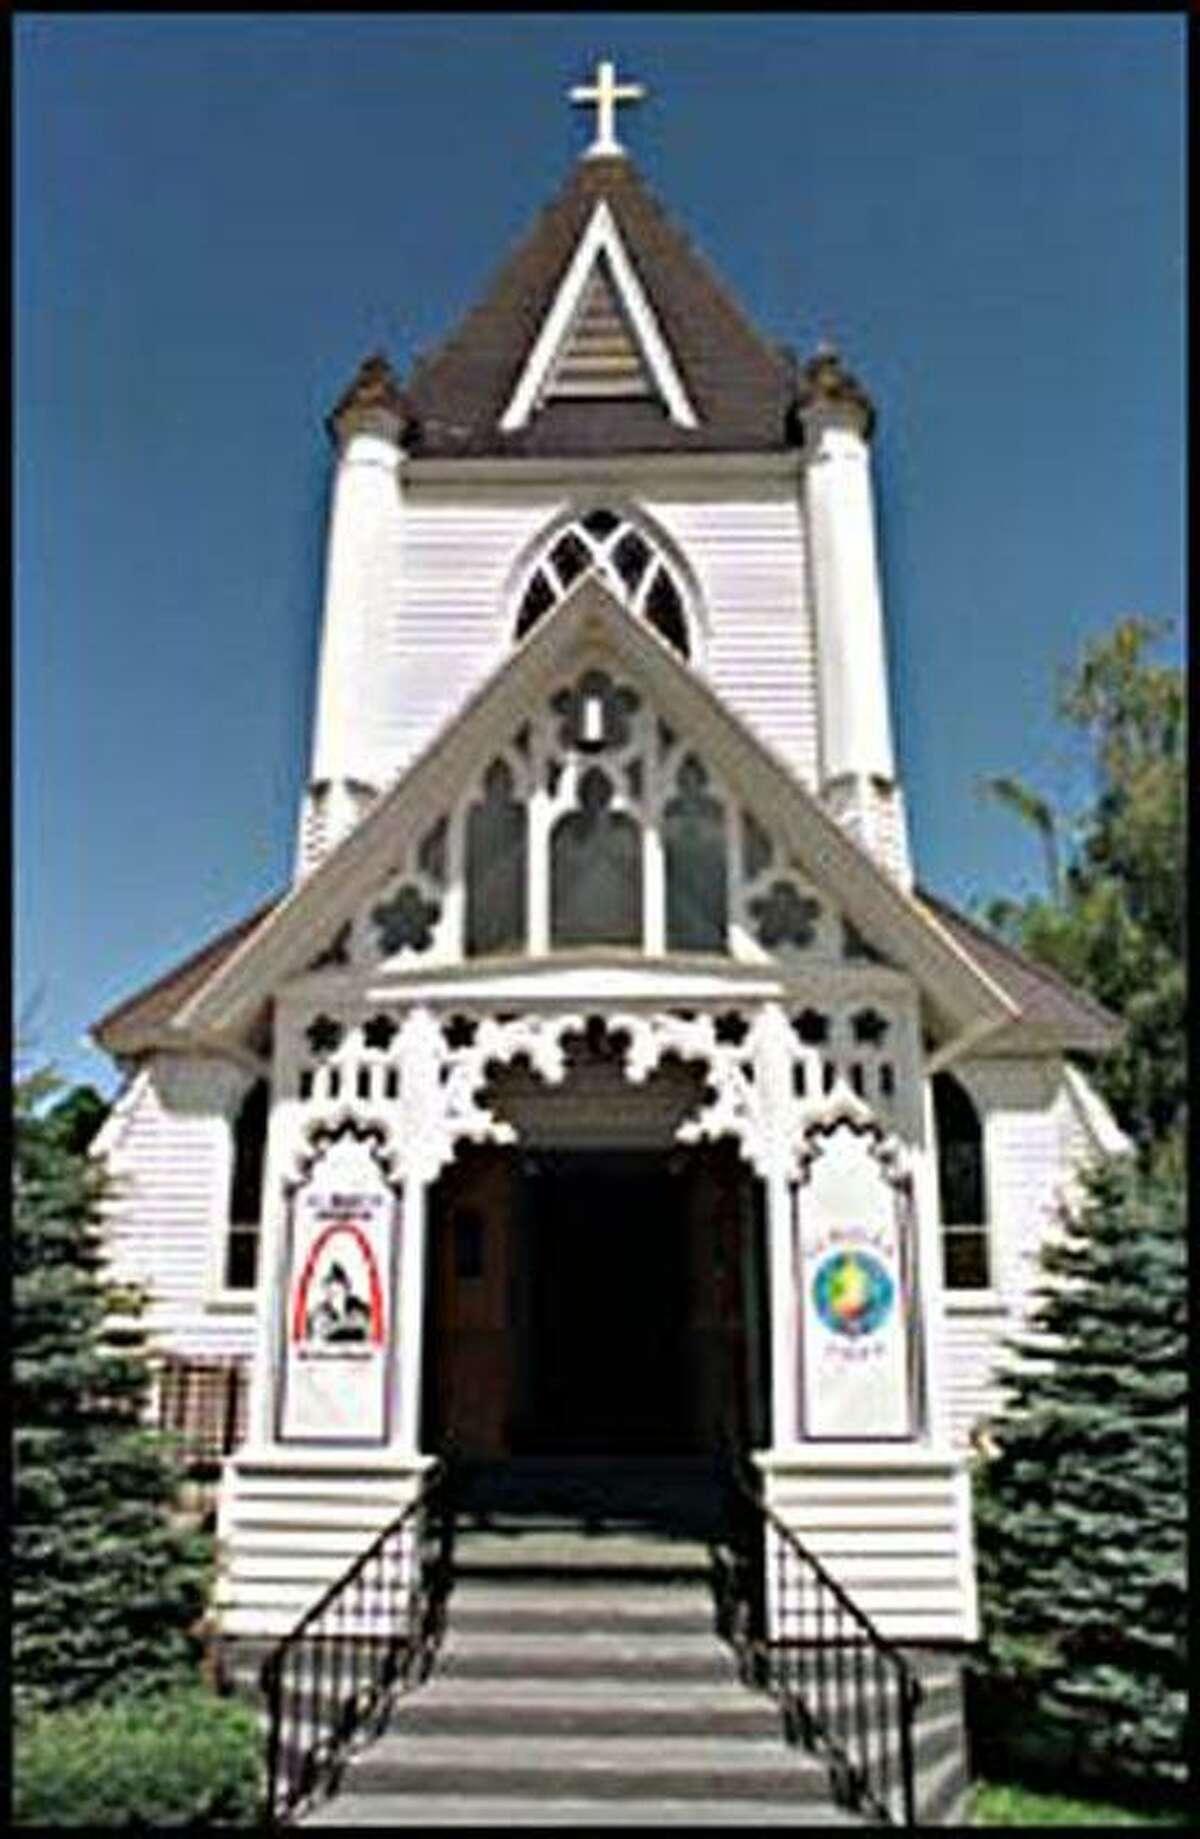 St. Mary's Church in Jamesville